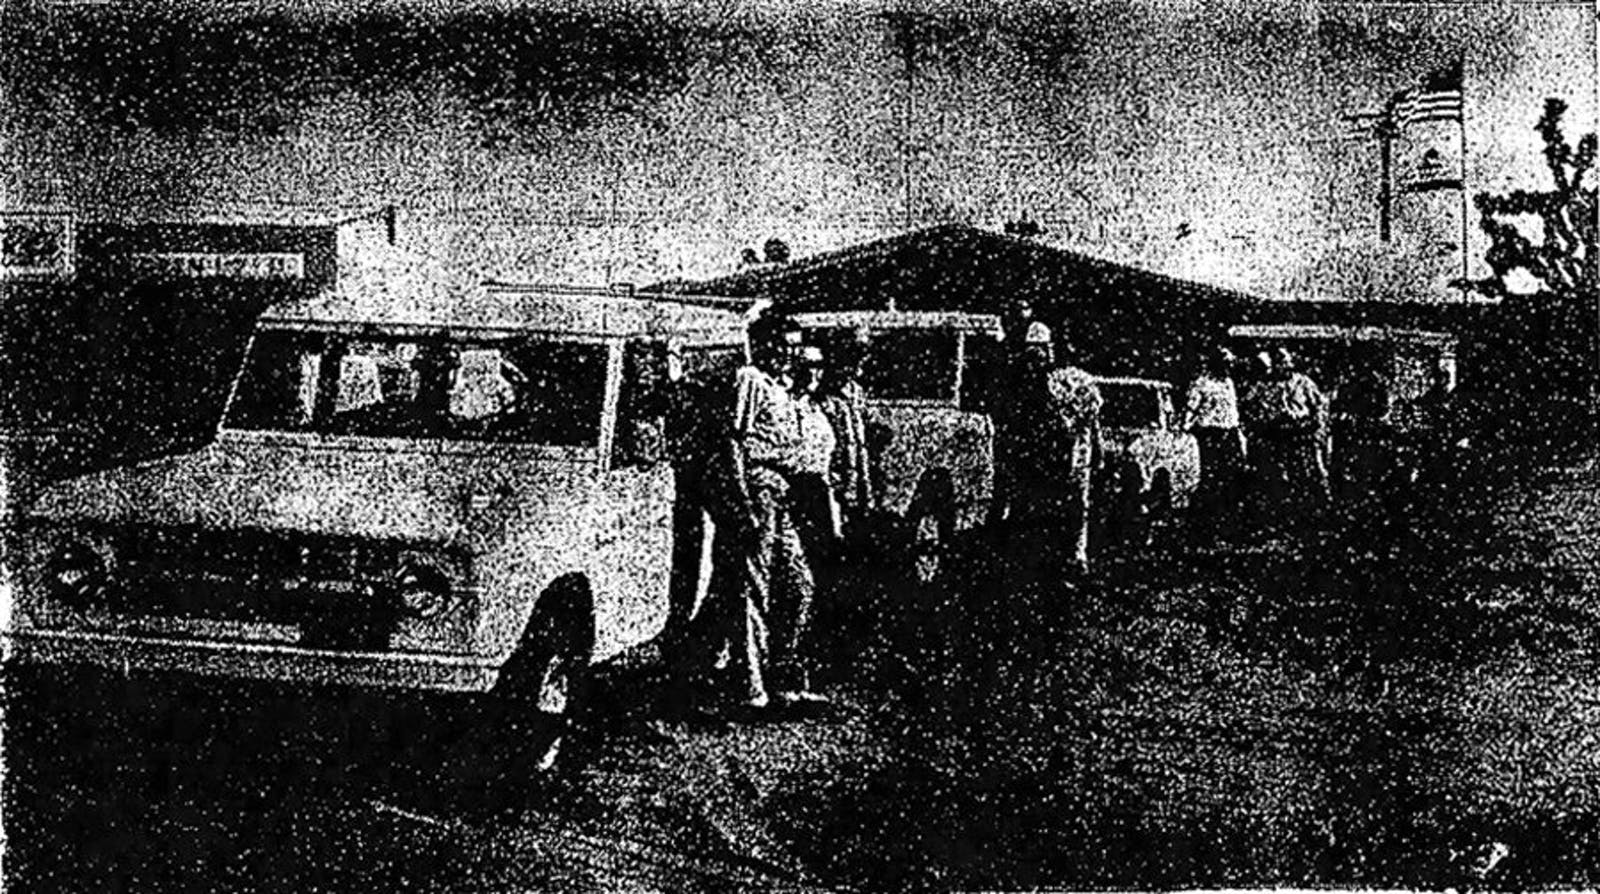 intrepid travelers jeeps image